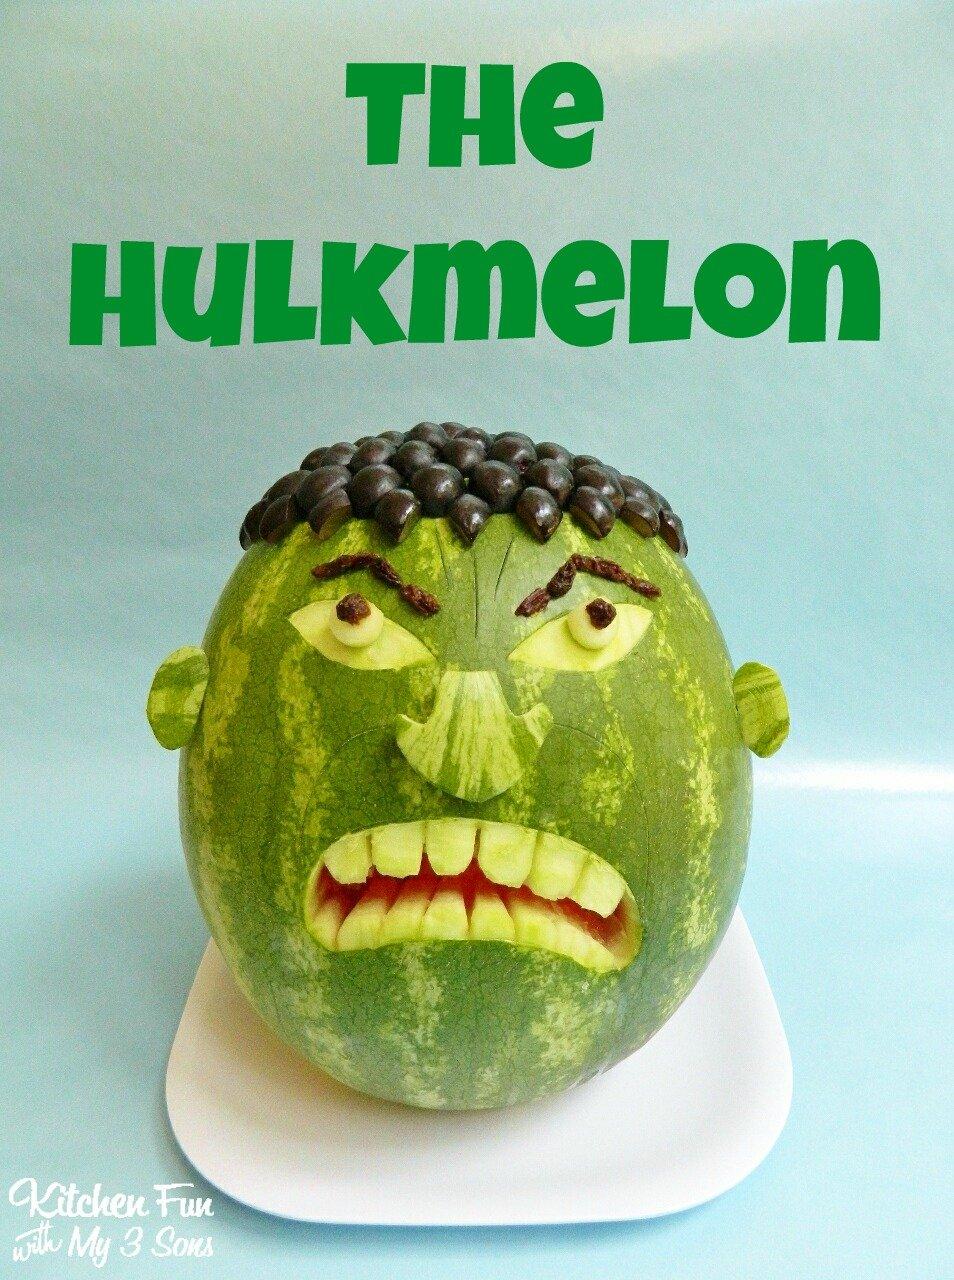 The Hulk Watermelon - Kitchen Fun With My 3 Sons